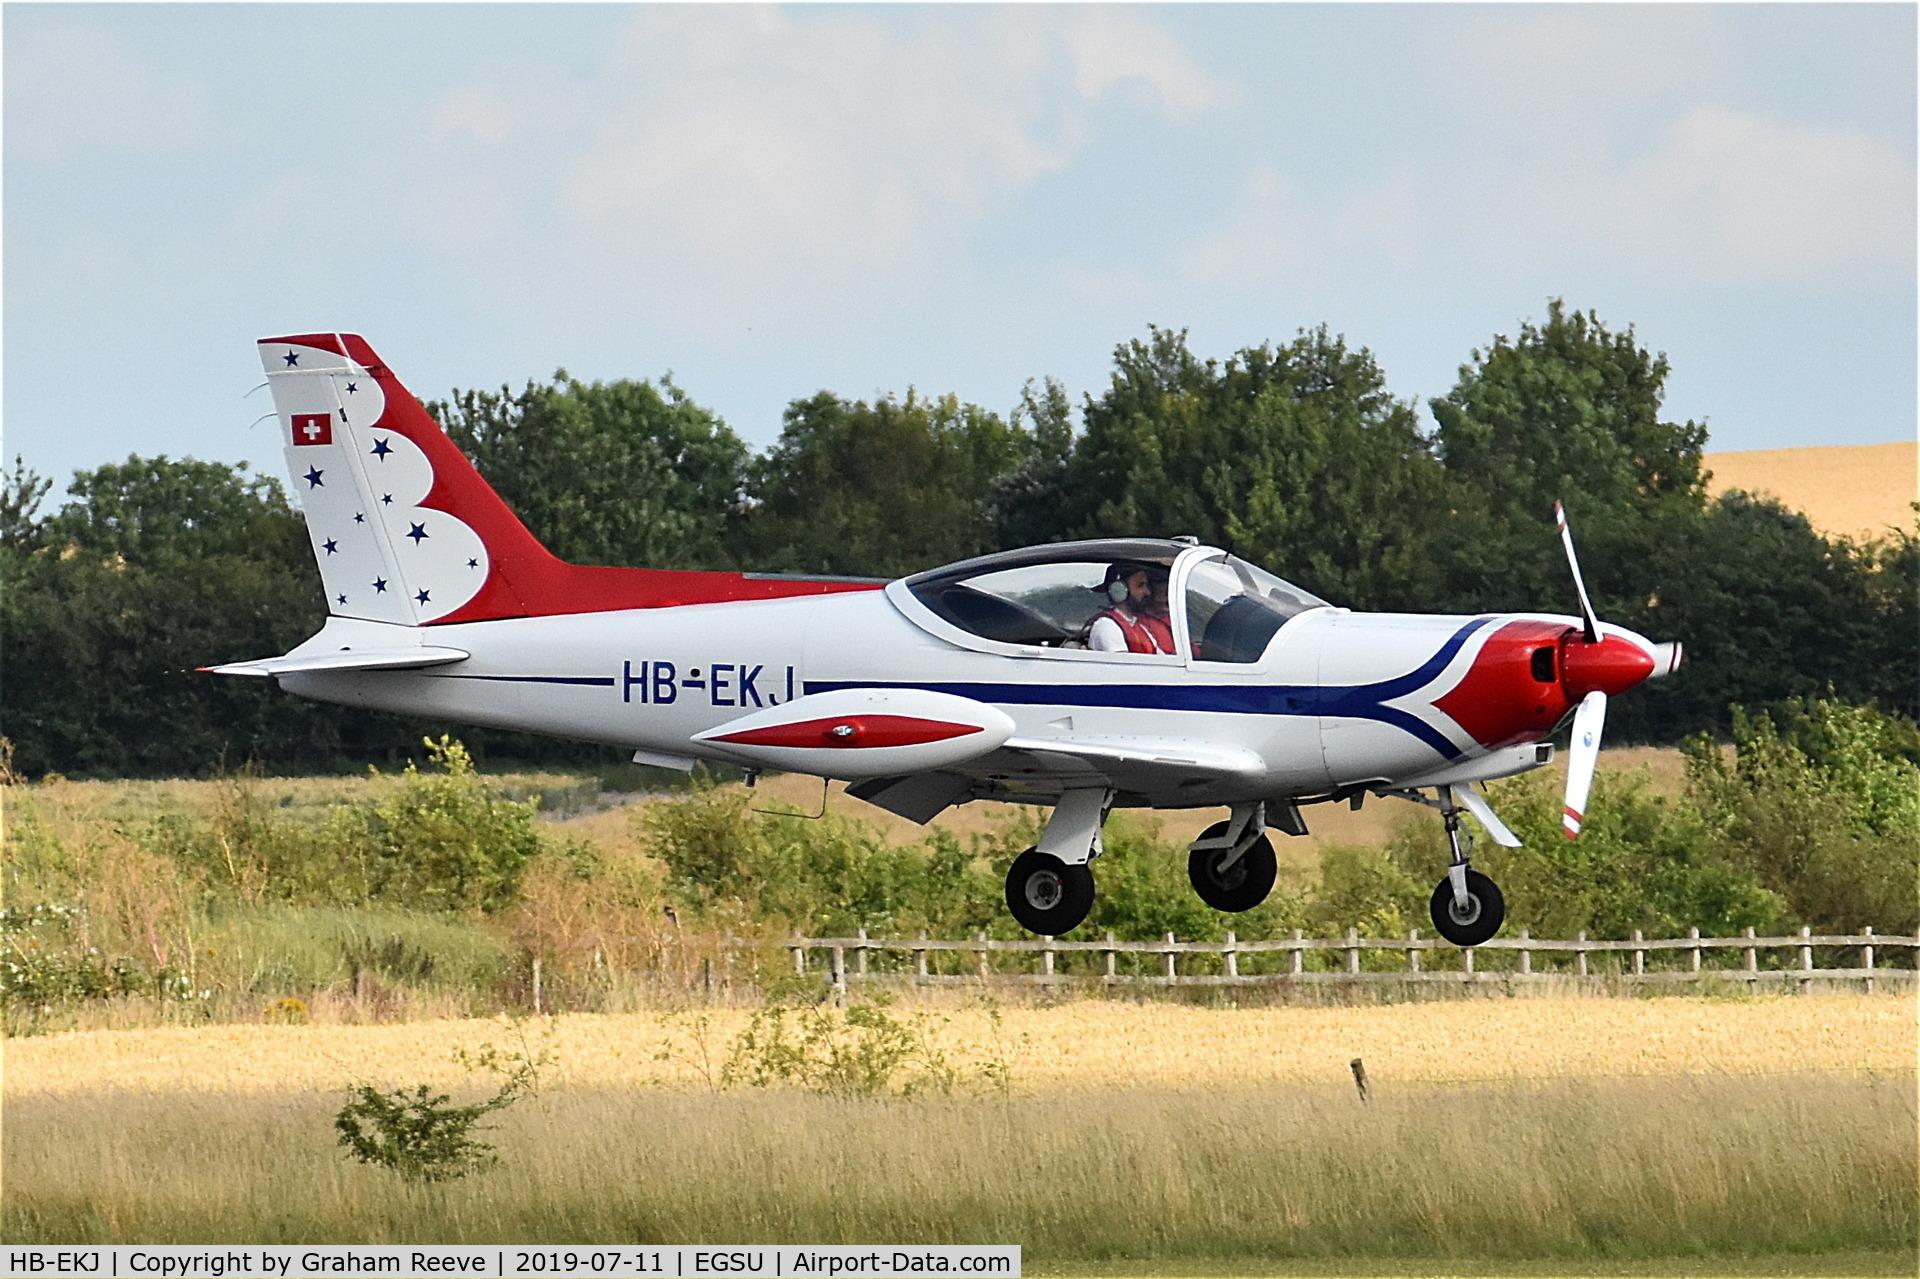 HB-EKJ, 1986 SIAI-Marchetti F-260D C/N 735/41-005, Landing at Duxford.